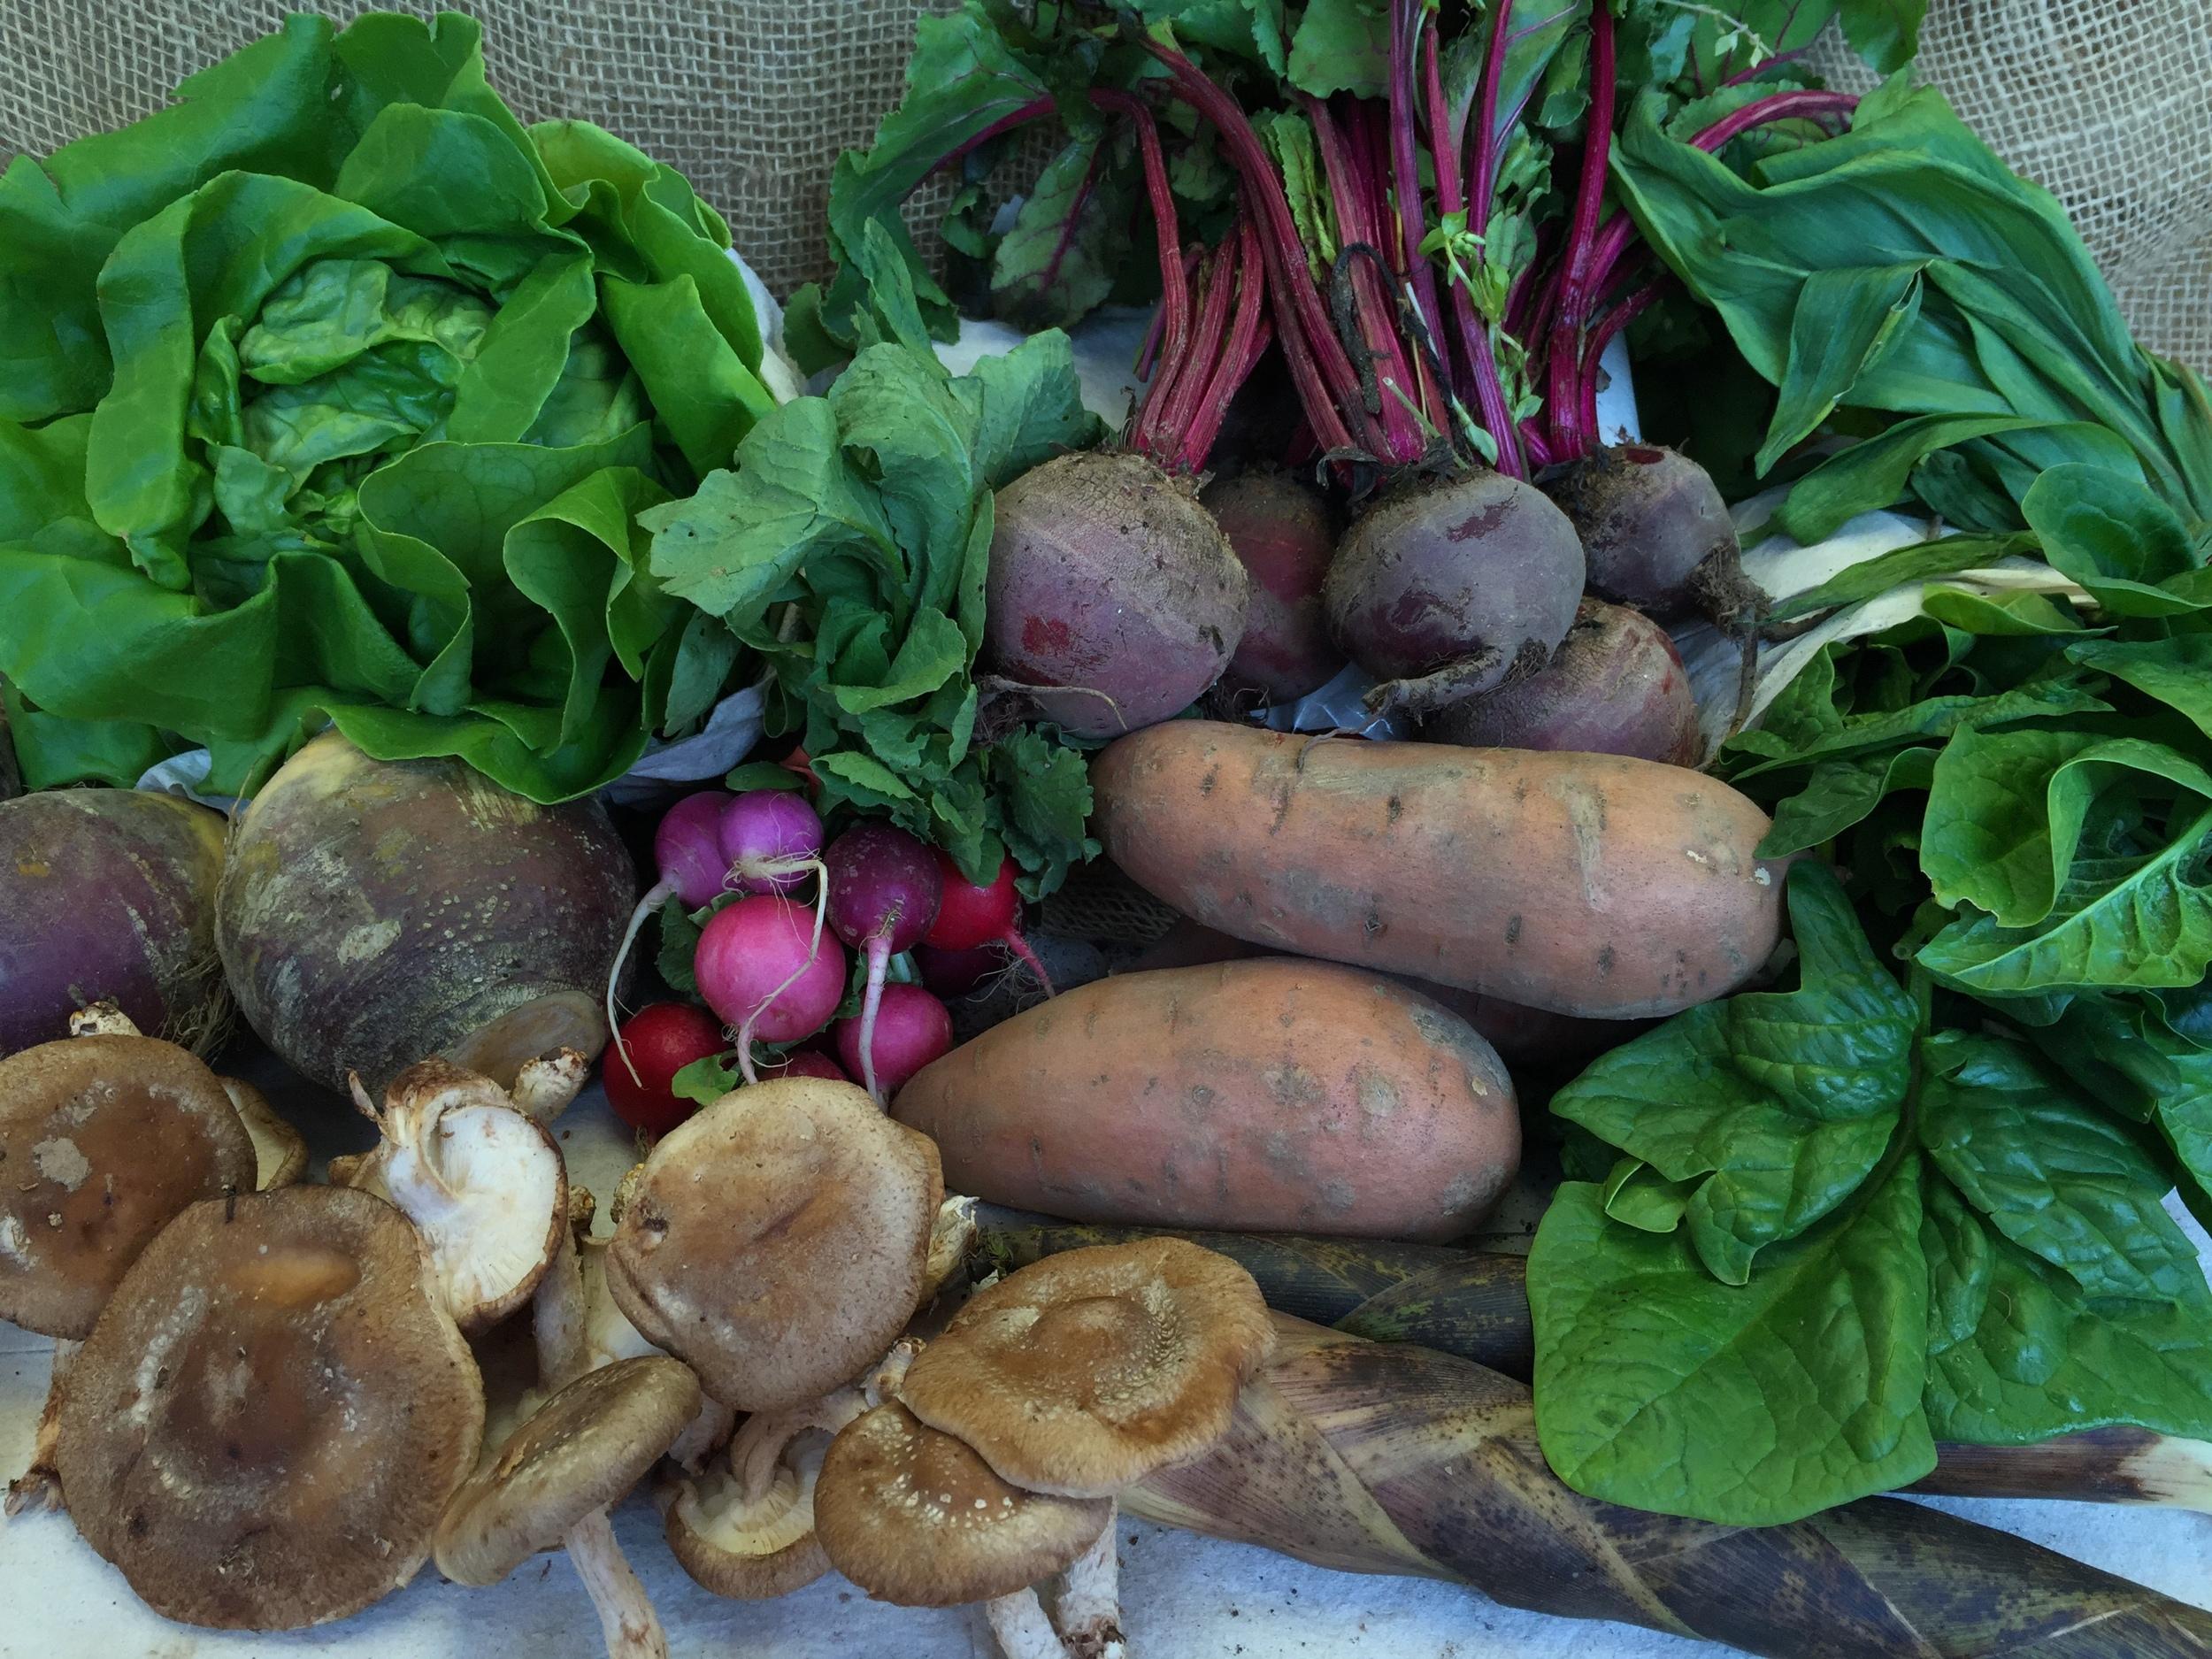 Hydroponic Lettuce, Strawberries, Rutabaga, Bamboo Chutes, Ramps, Beets, Cremini Mushrooms, Sweet Potatoes, Spinach.